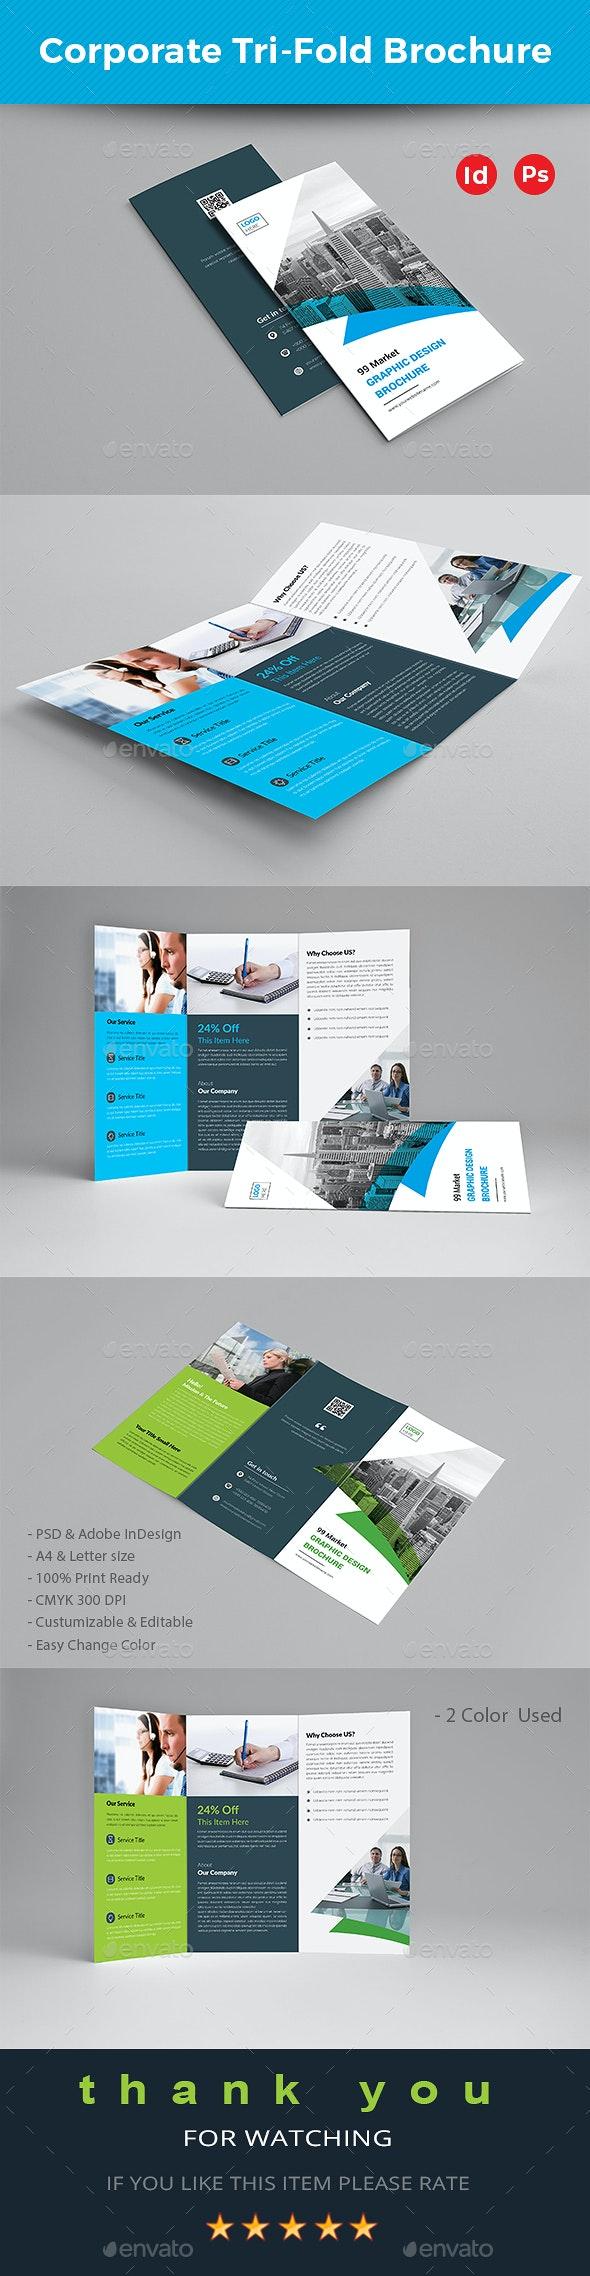 Corporate Trifold Brochure - Brochures Print Templates